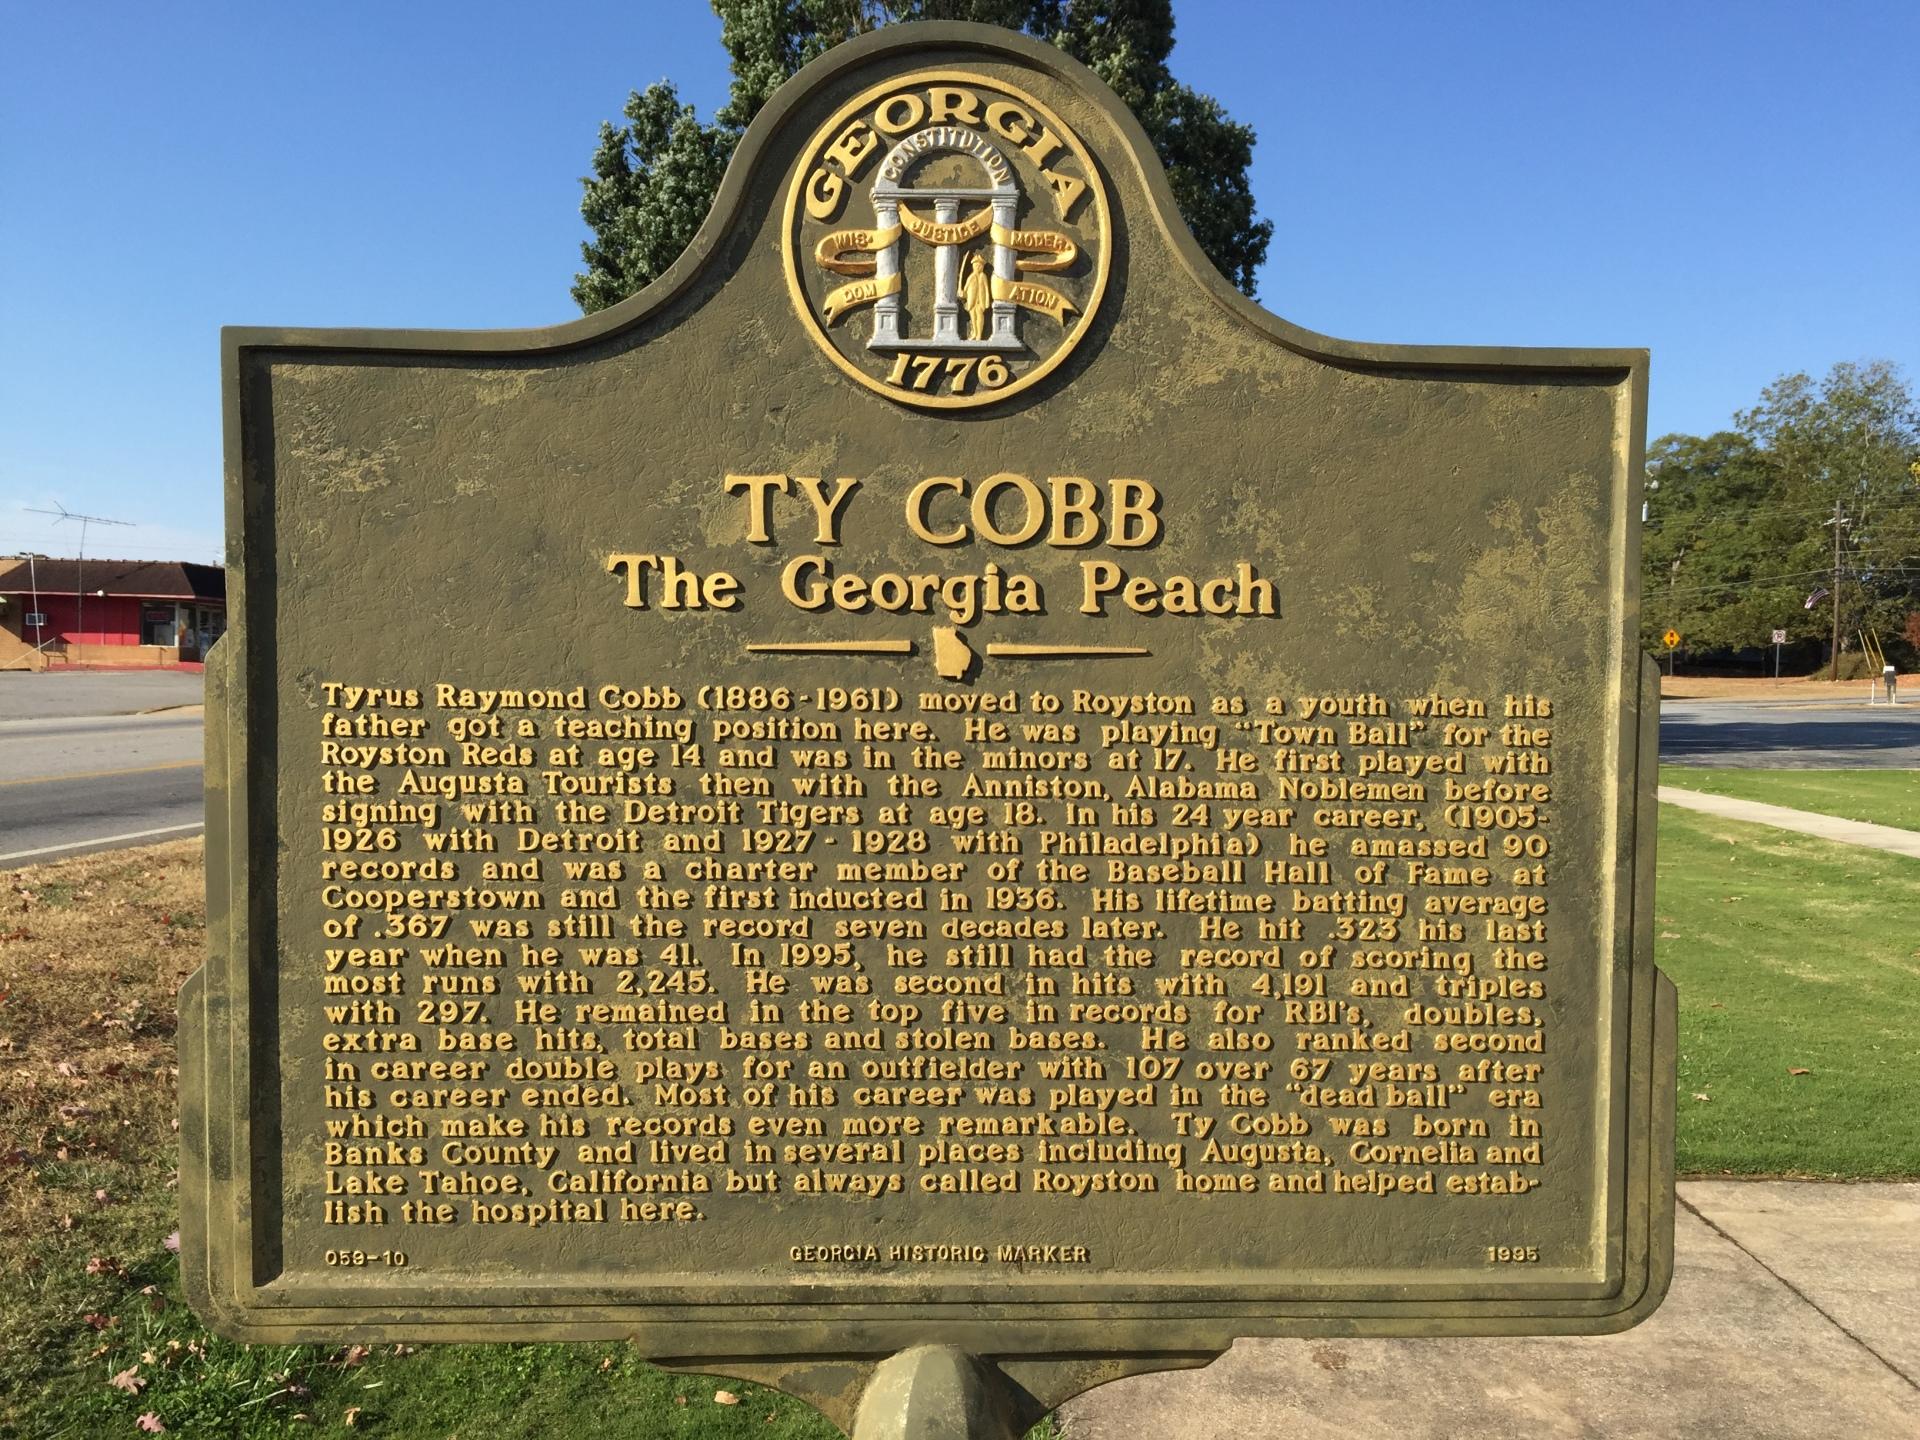 Ty Cobb Historical Marker